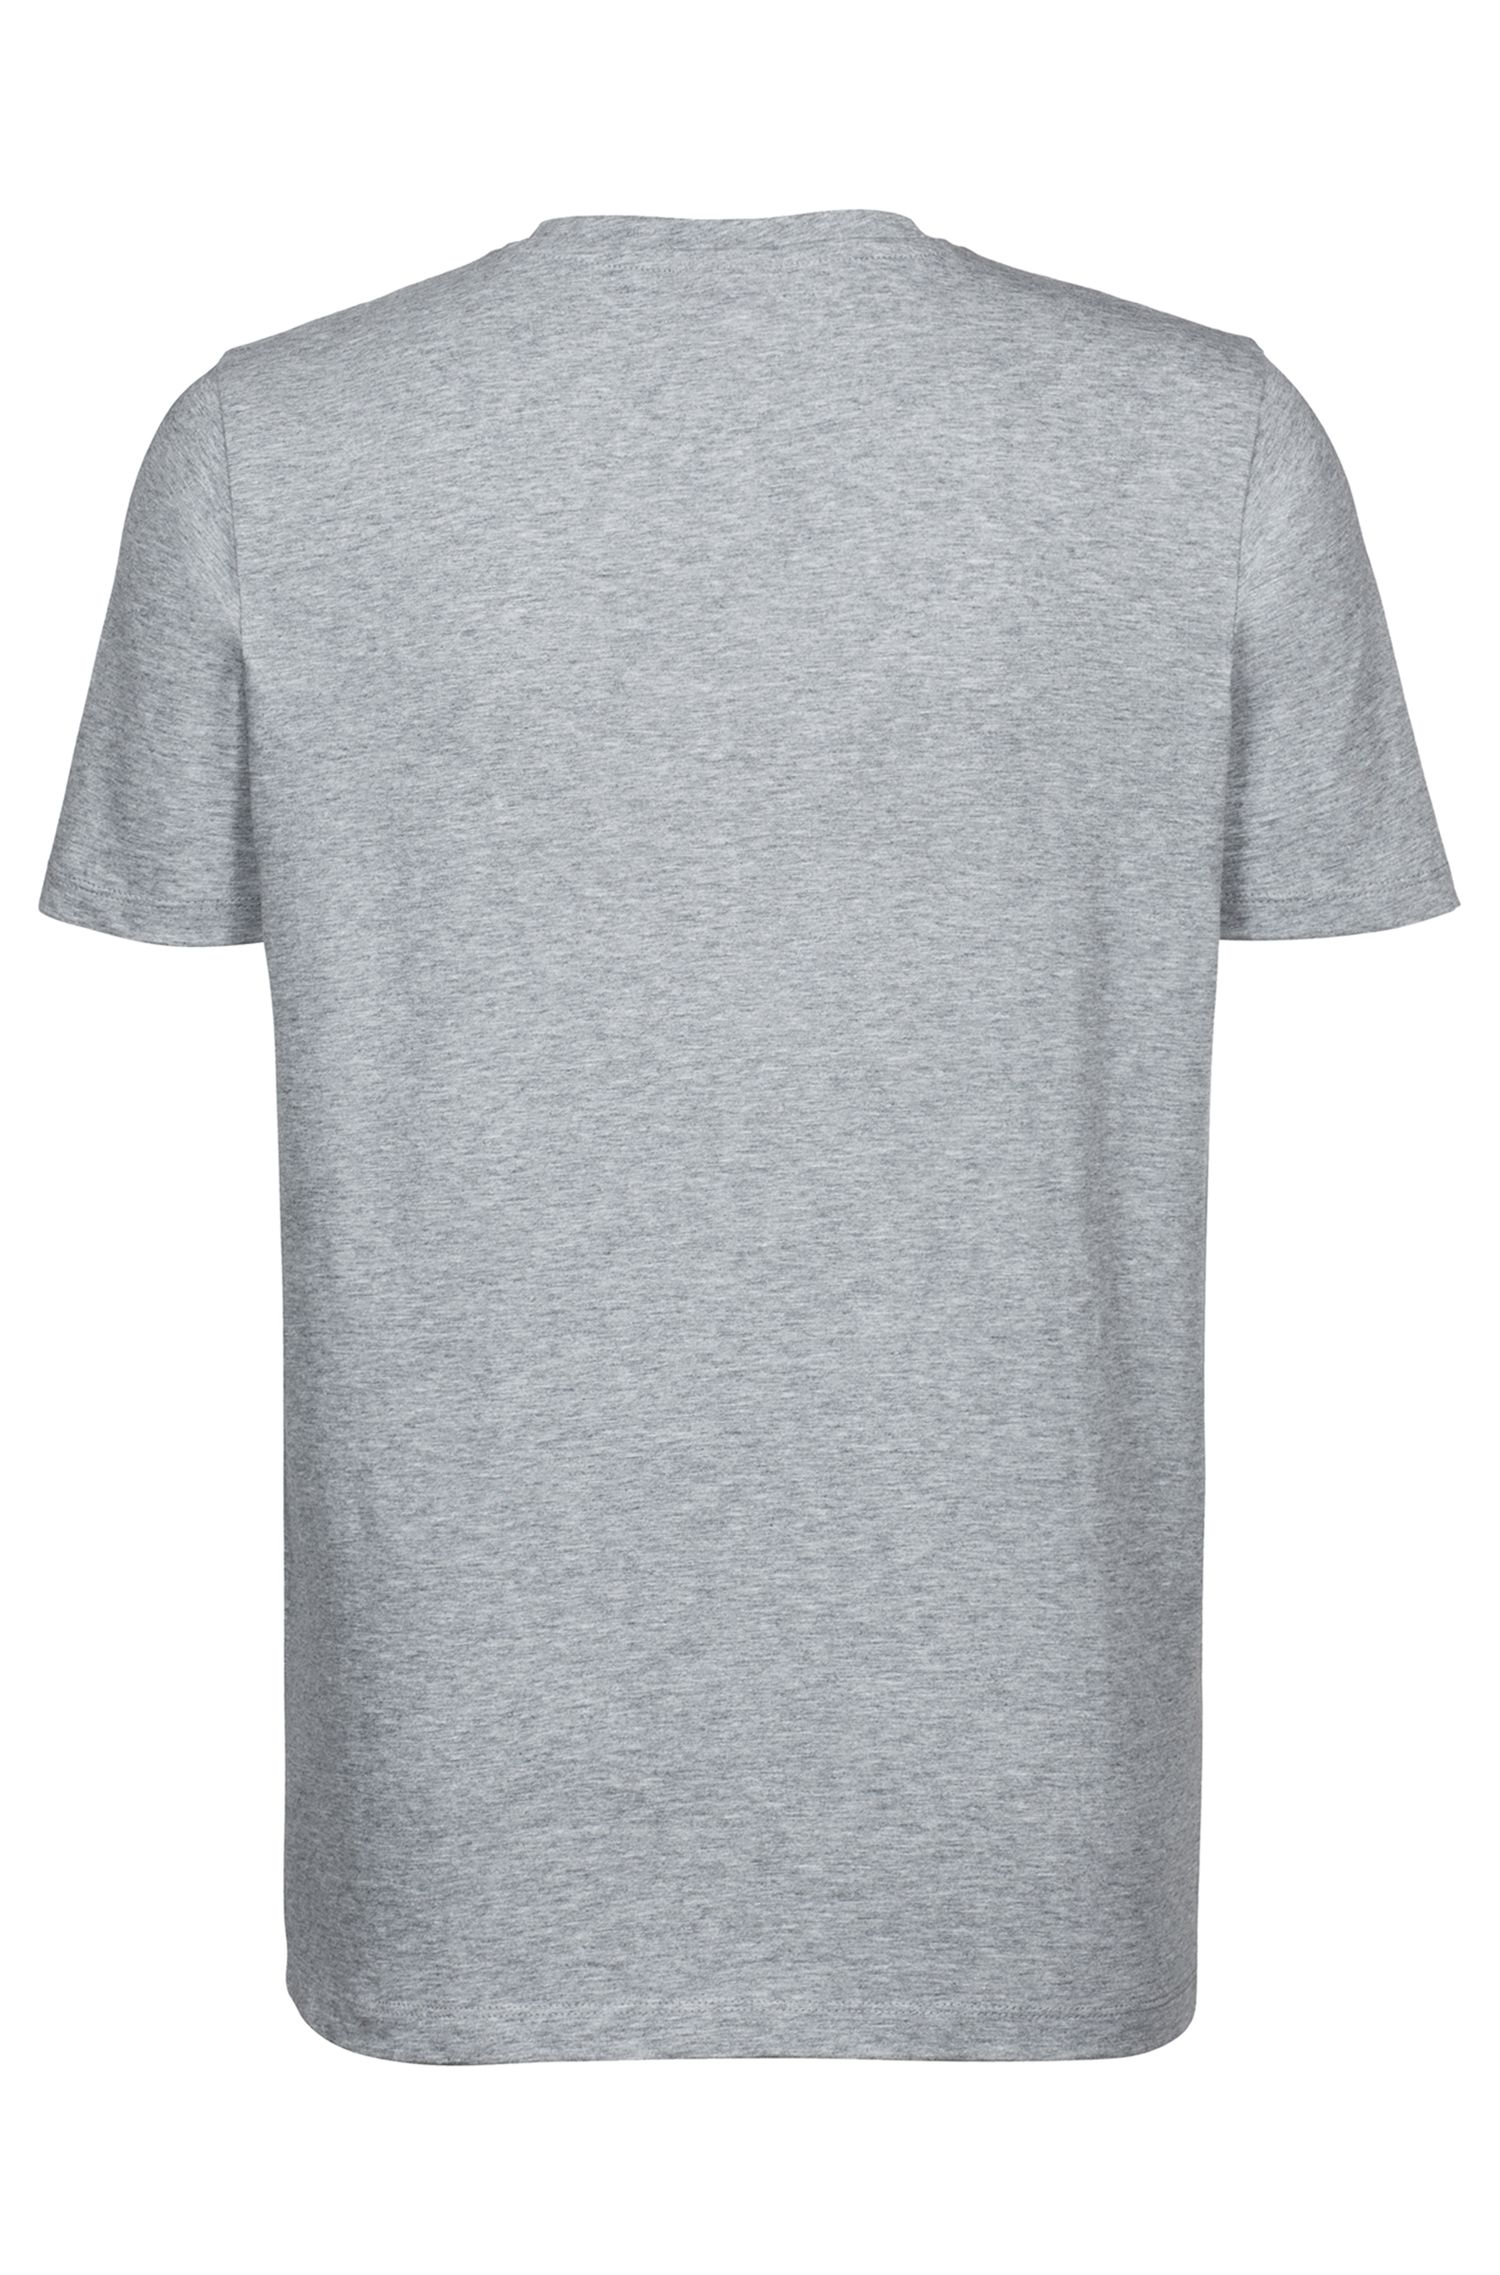 Camiseta con logo en algodón de punto sencillo, Gris